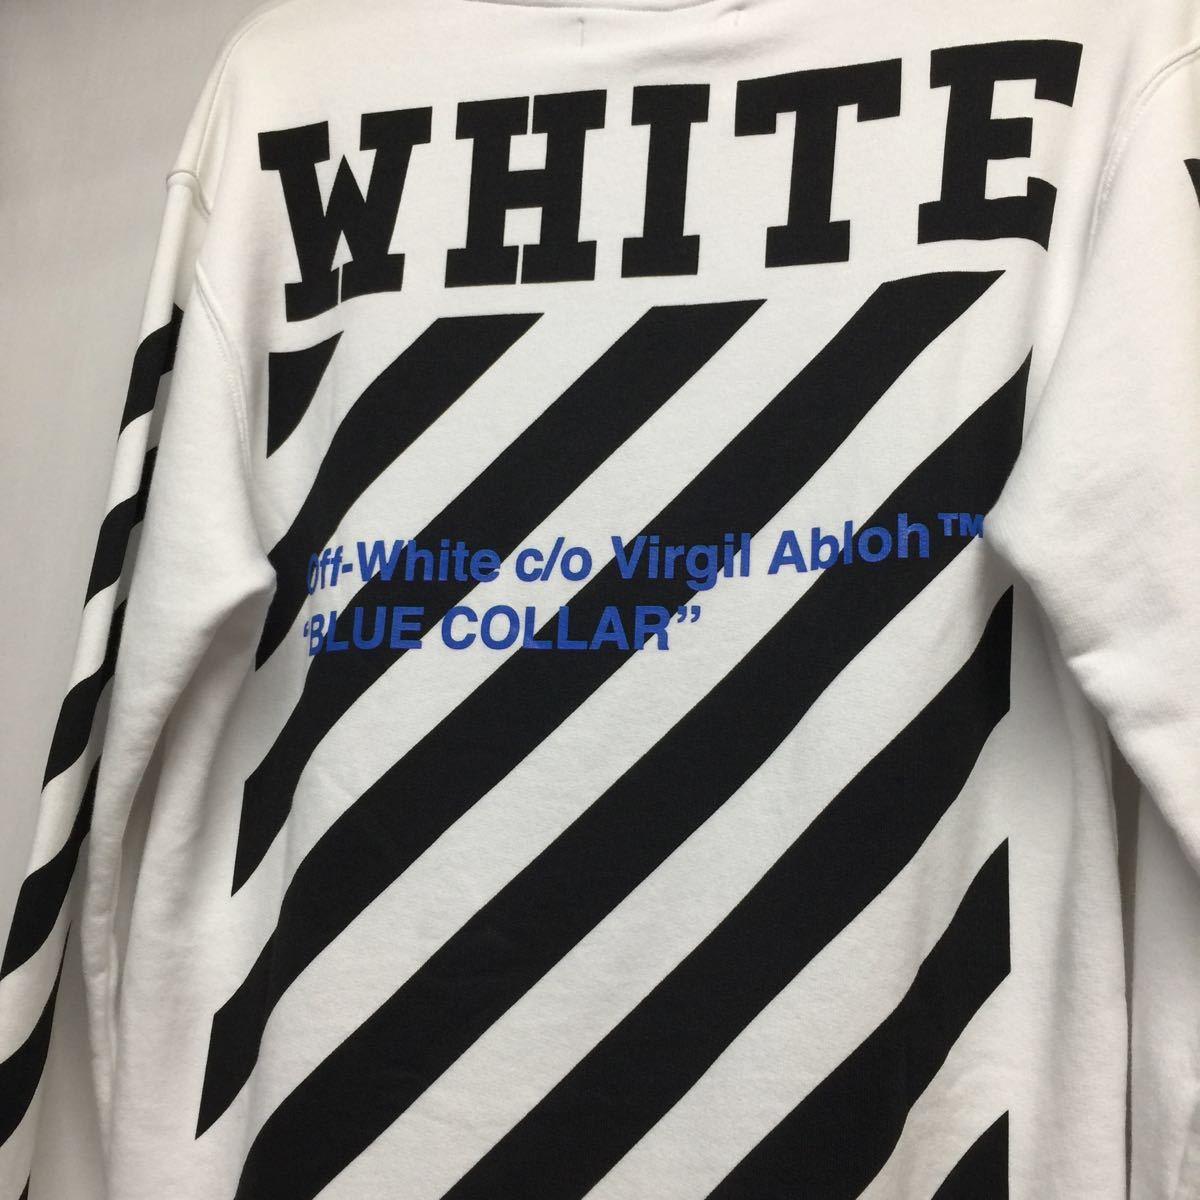 【OFF-WHITE オフホワイト】VIRGIL ABLOH ブラックスプレーロゴパーカー パーカー フーディー コットン ホワイト 白 S バップリント_画像6